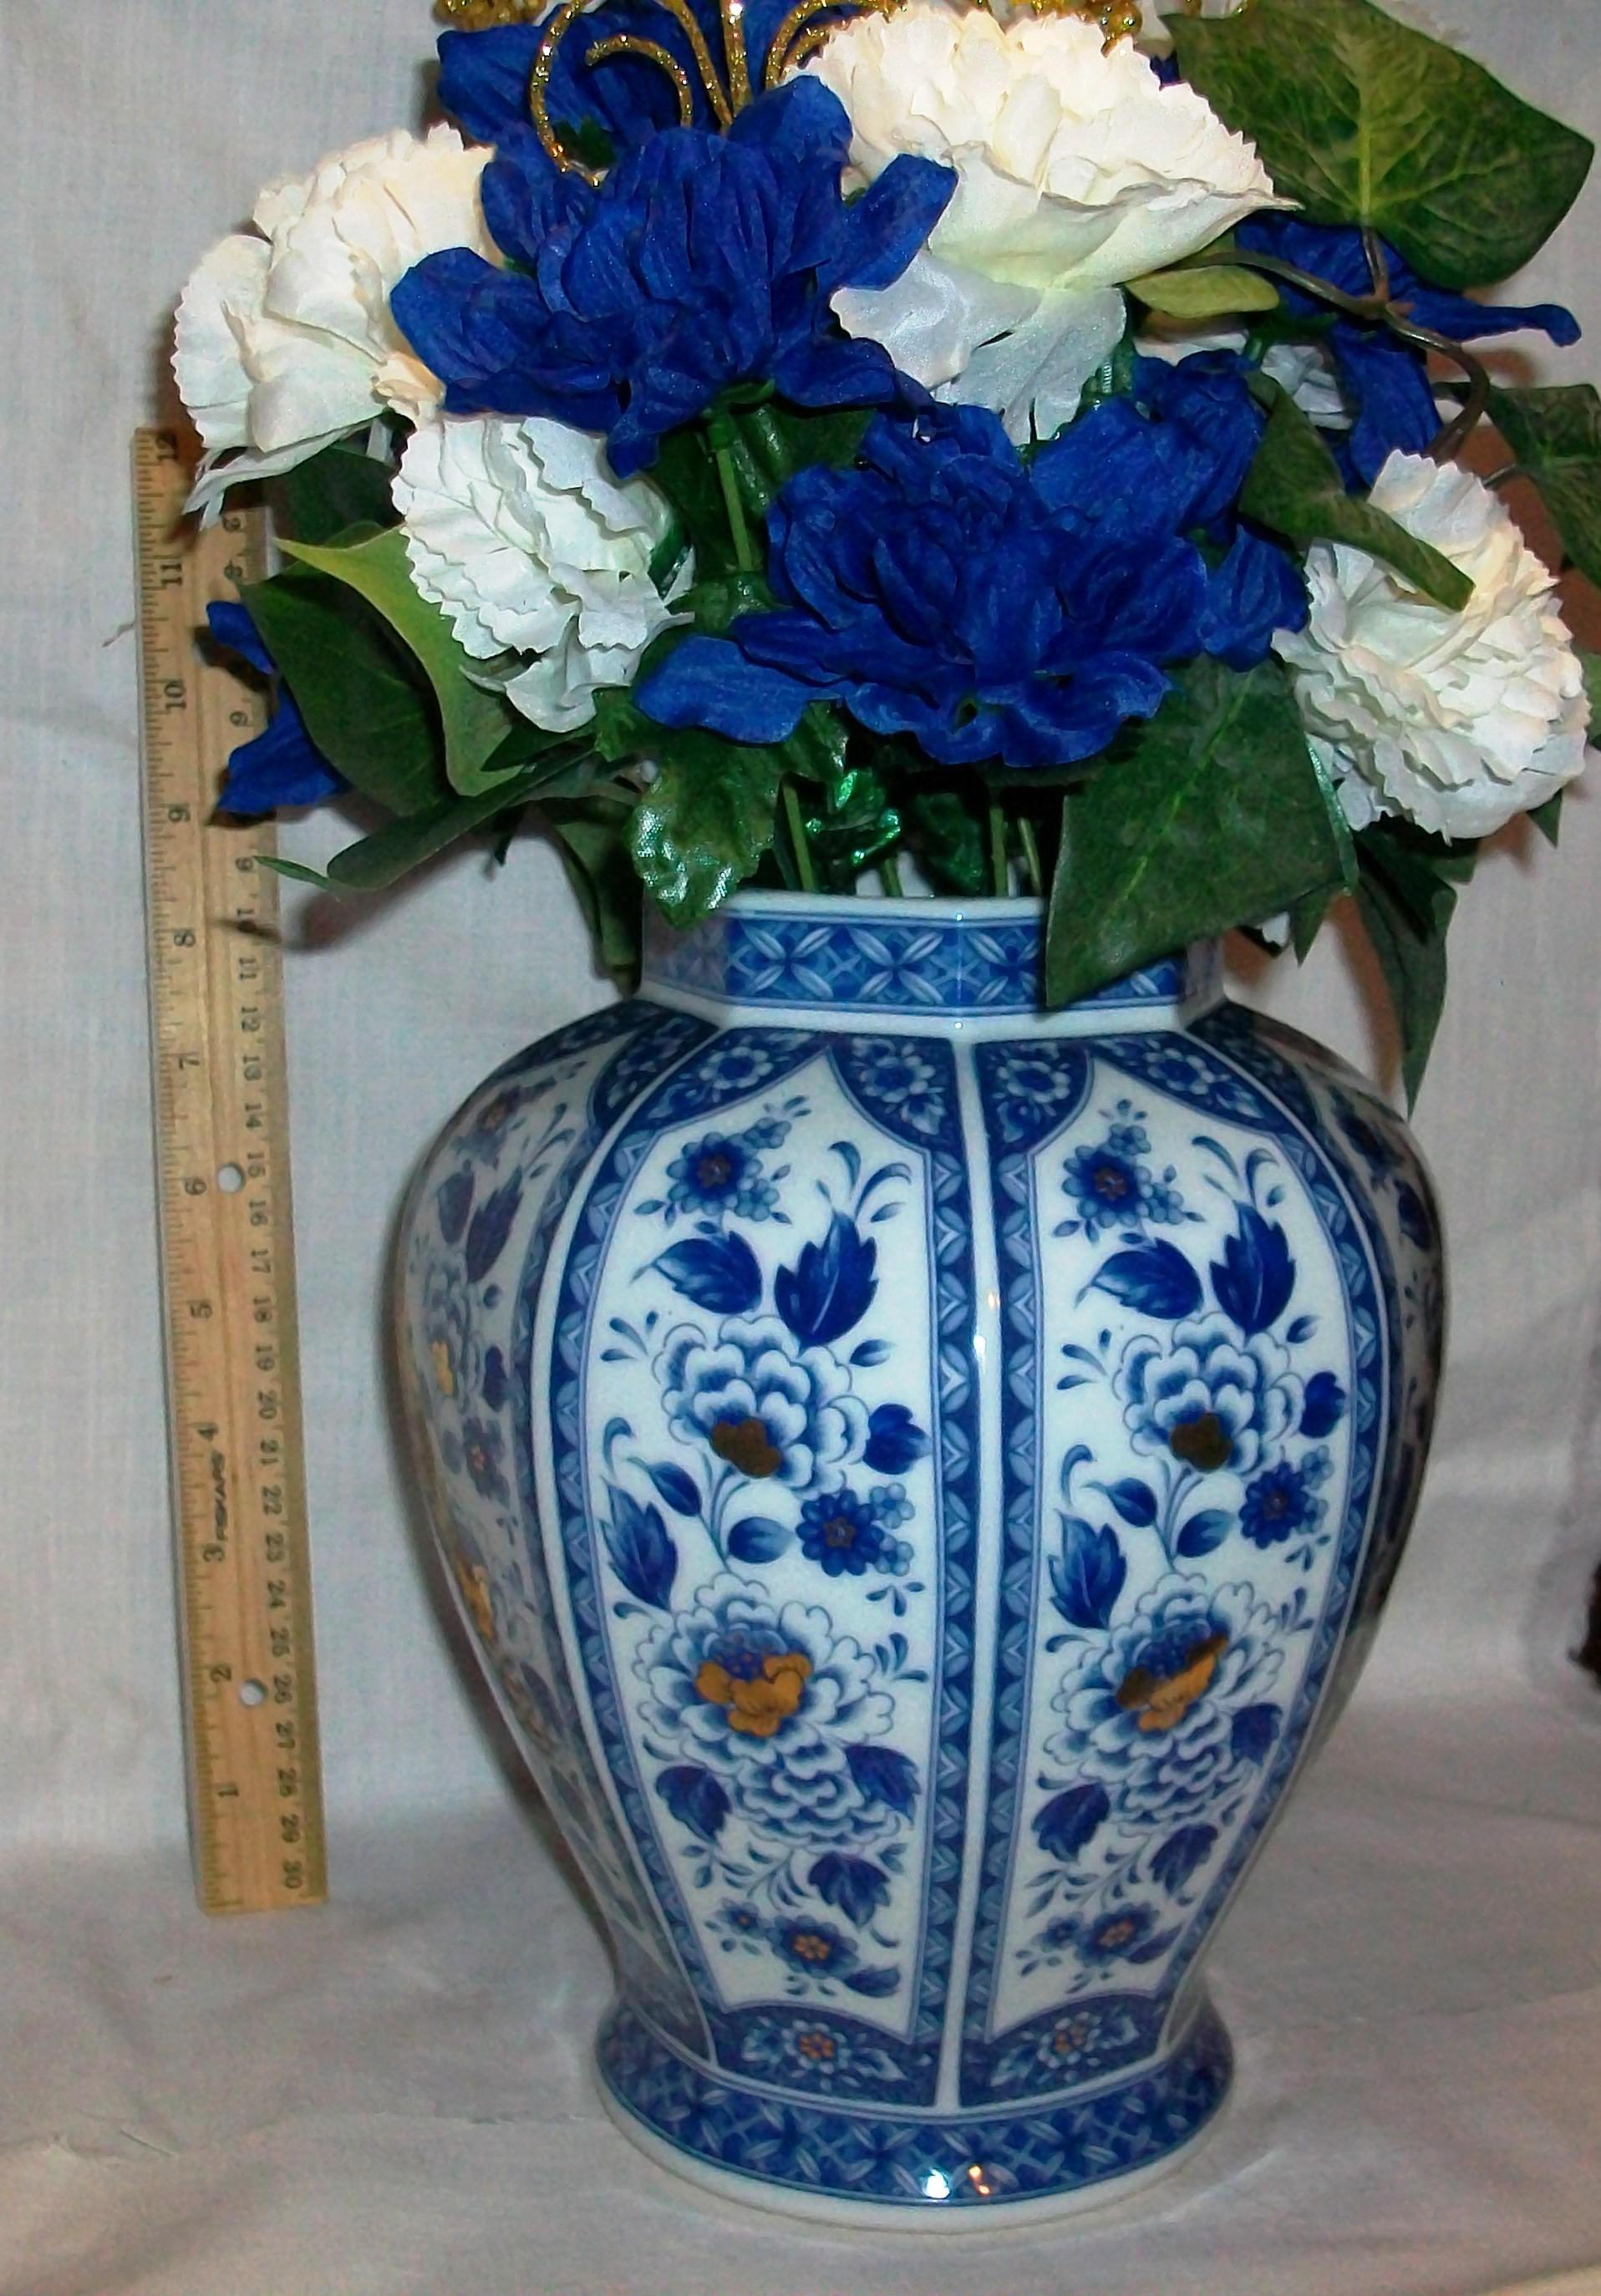 blue glass vase set of dark blue vase images living room cobalt blue vases new 4040cih with regard to dark blue vase stock listing 128 is an asian hand painted blue and gold vase of